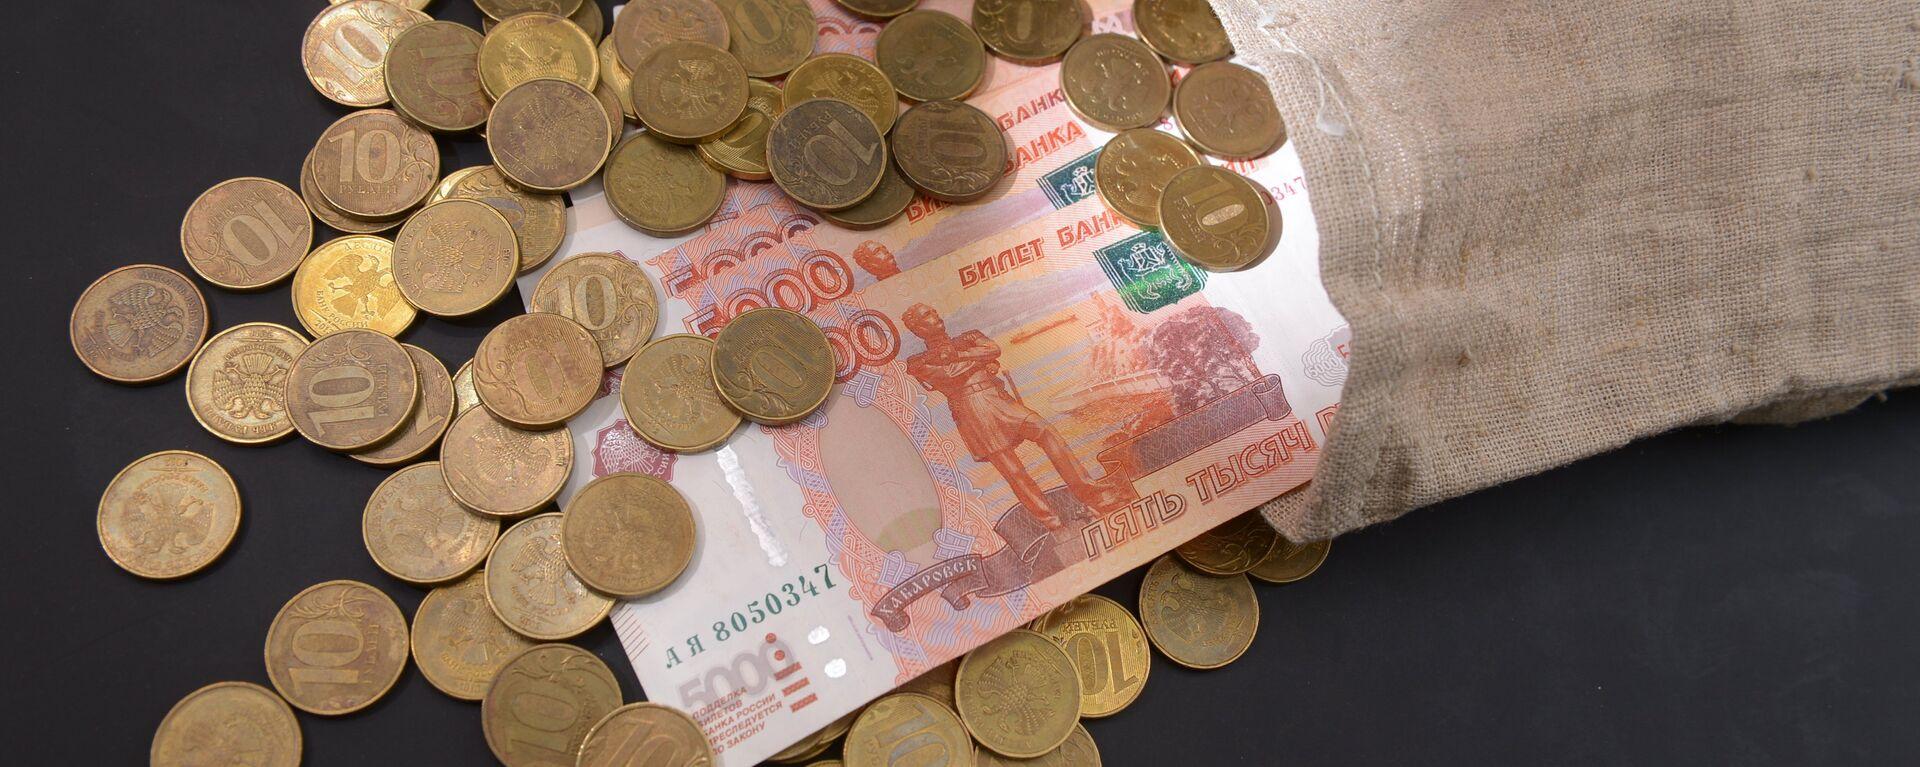 Monedas y billetes del rublo ruso - Sputnik Mundo, 1920, 21.08.2021